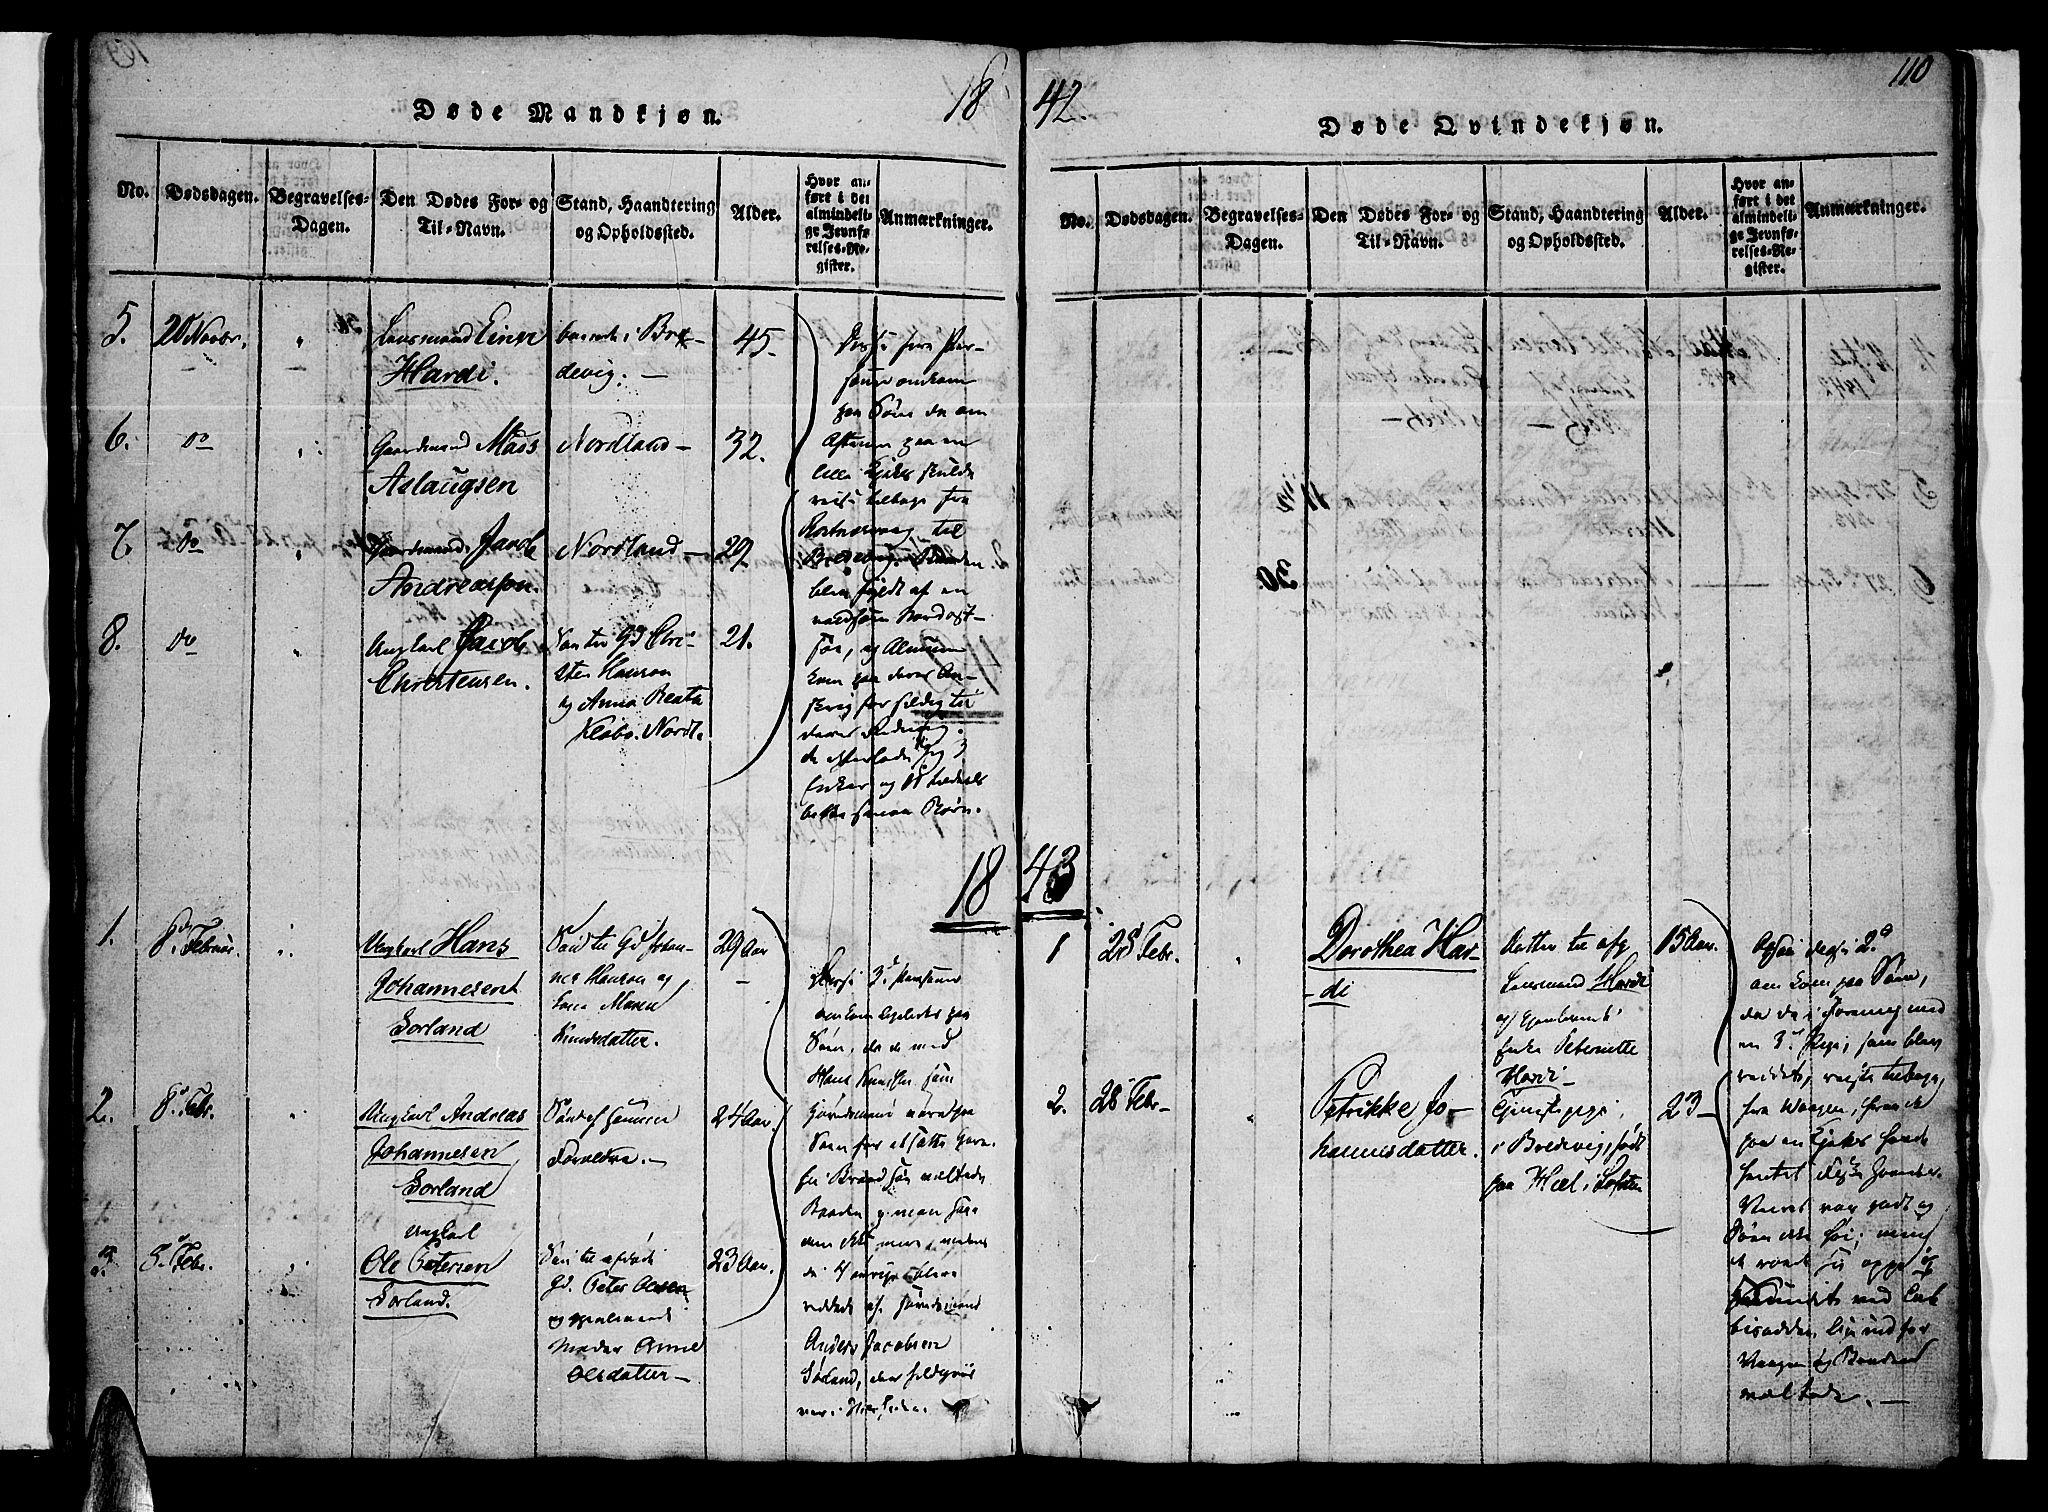 SAT, Ministerialprotokoller, klokkerbøker og fødselsregistre - Nordland, 807/L0120: Ministerialbok nr. 807A03, 1821-1848, s. 110